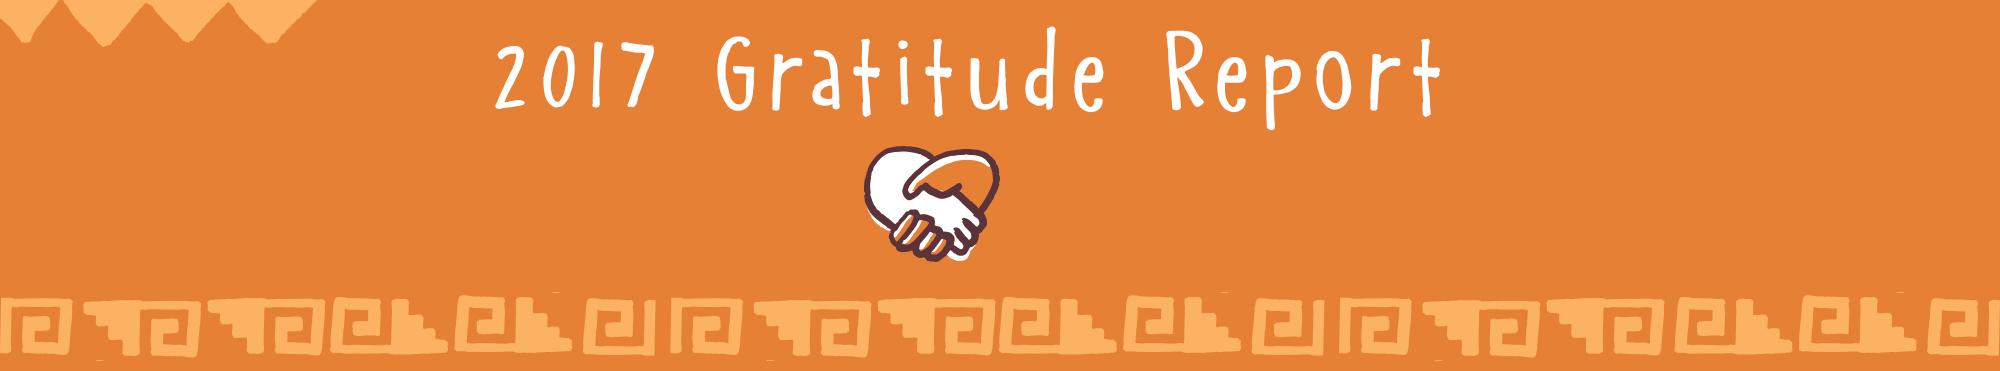 2017 Gratitude Report Banner